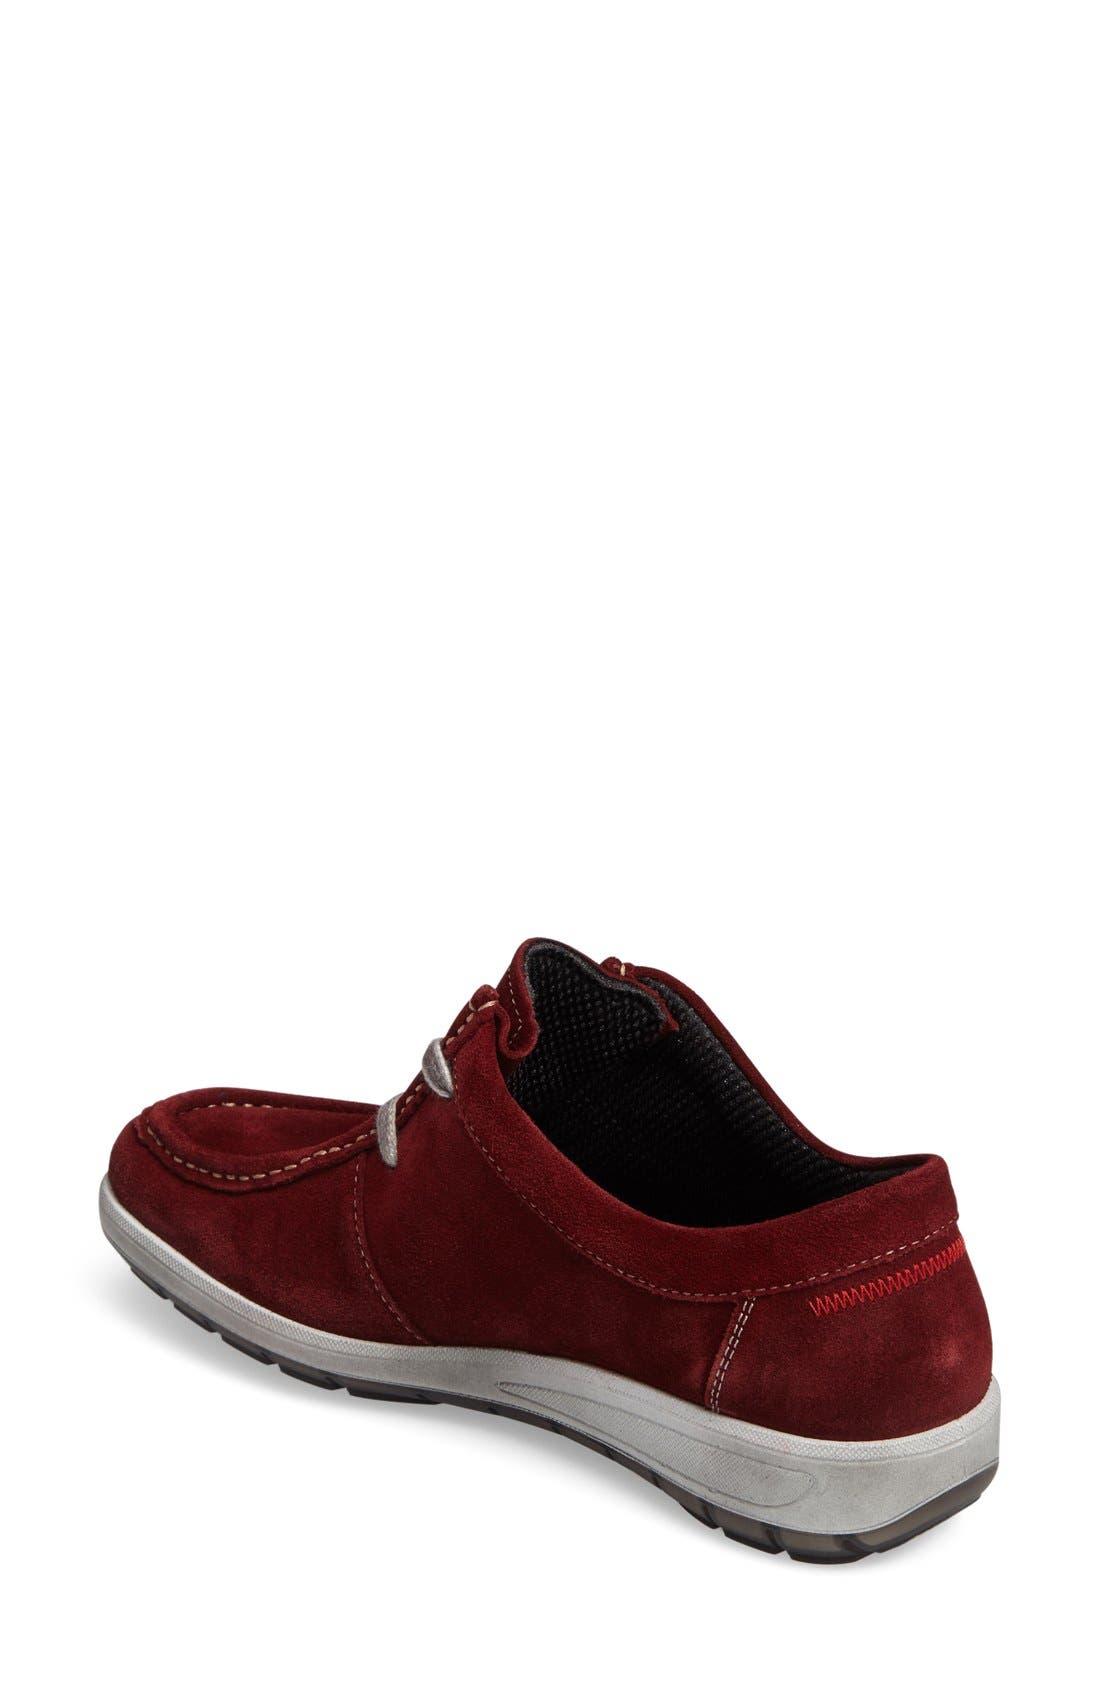 Trista Sneaker,                             Alternate thumbnail 2, color,                             Burgundy Suede